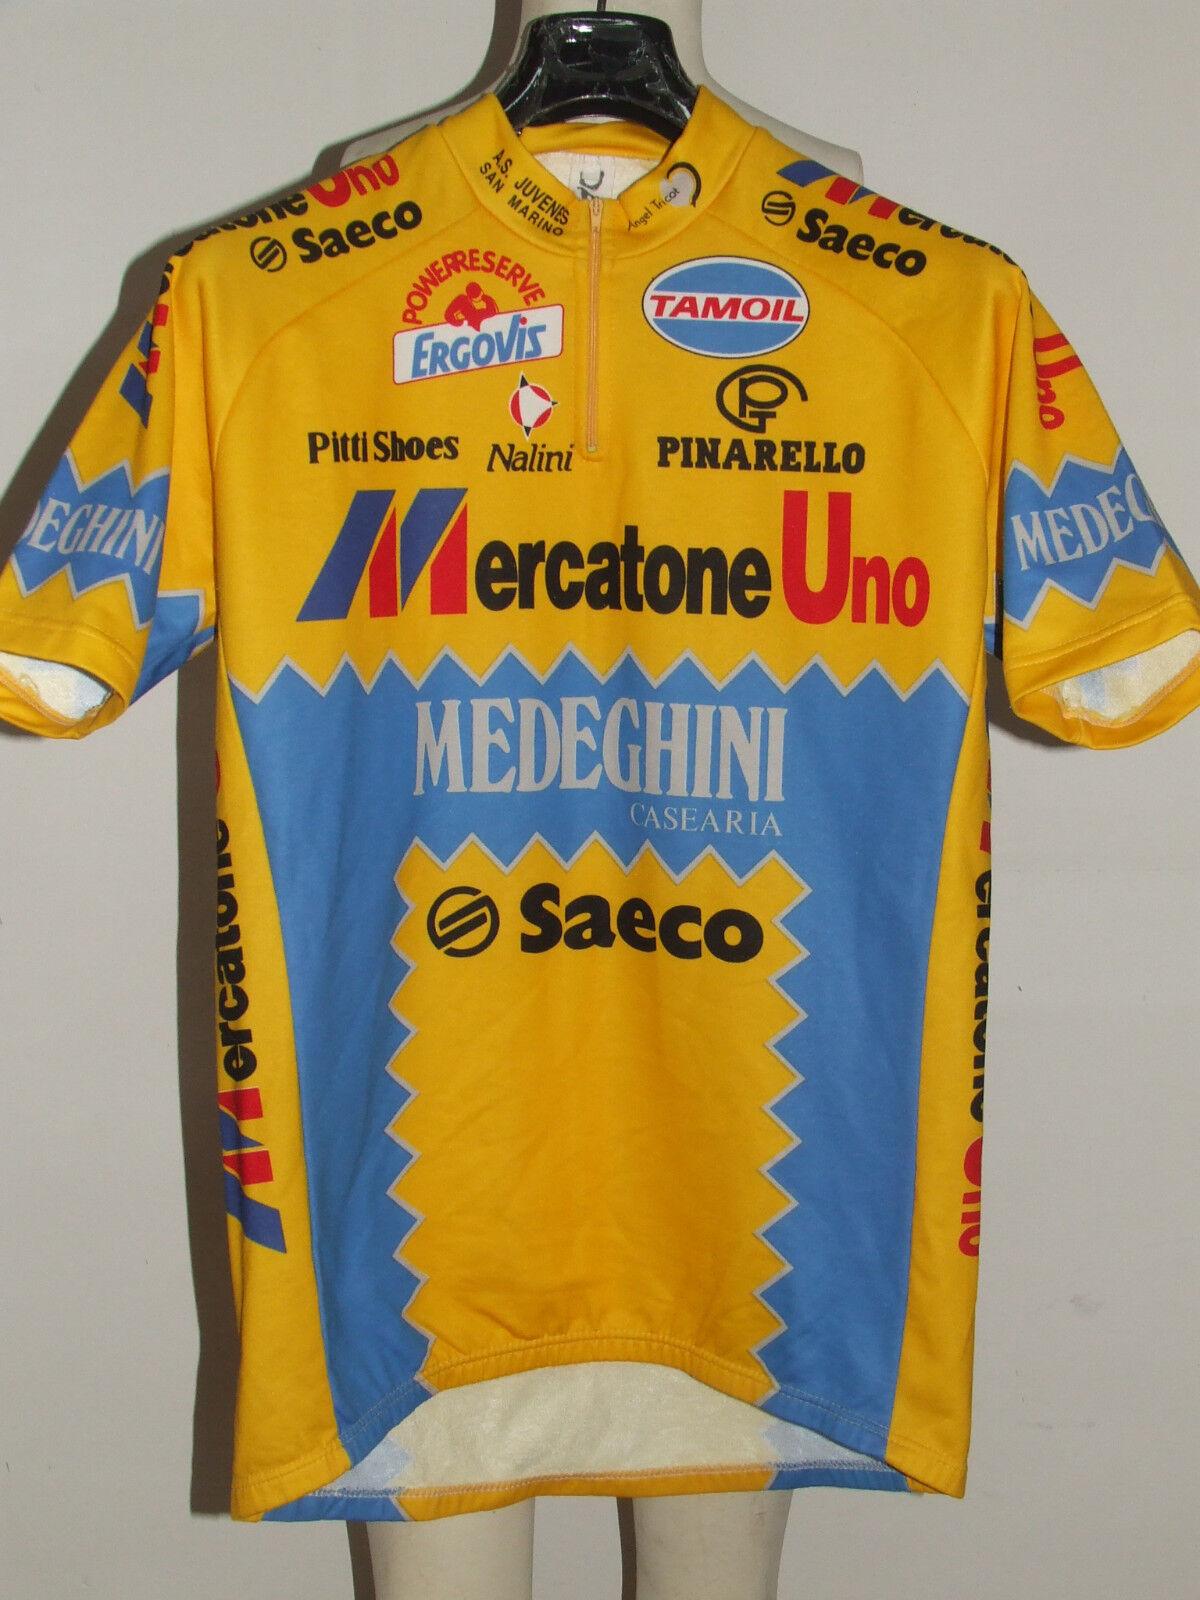 MAILLOT DE VÉLO HAUT CYCLISME MAILLOT CYCLISME HAUT équipe MERCATONE UN NALINI SAECO tg XL 0c610d